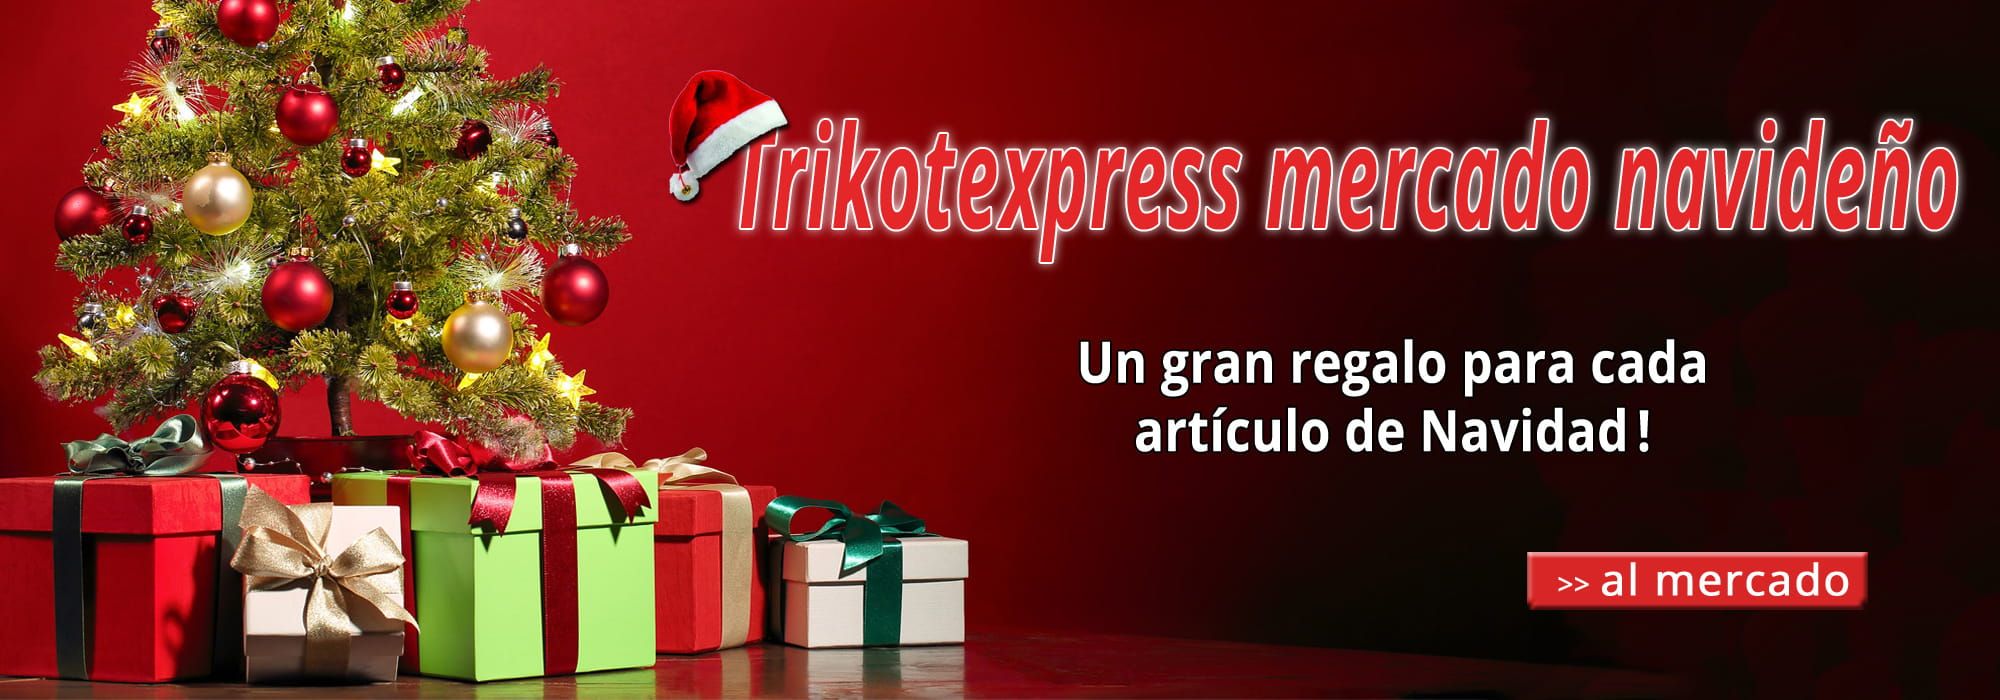 Trikotexpress mercado navideño